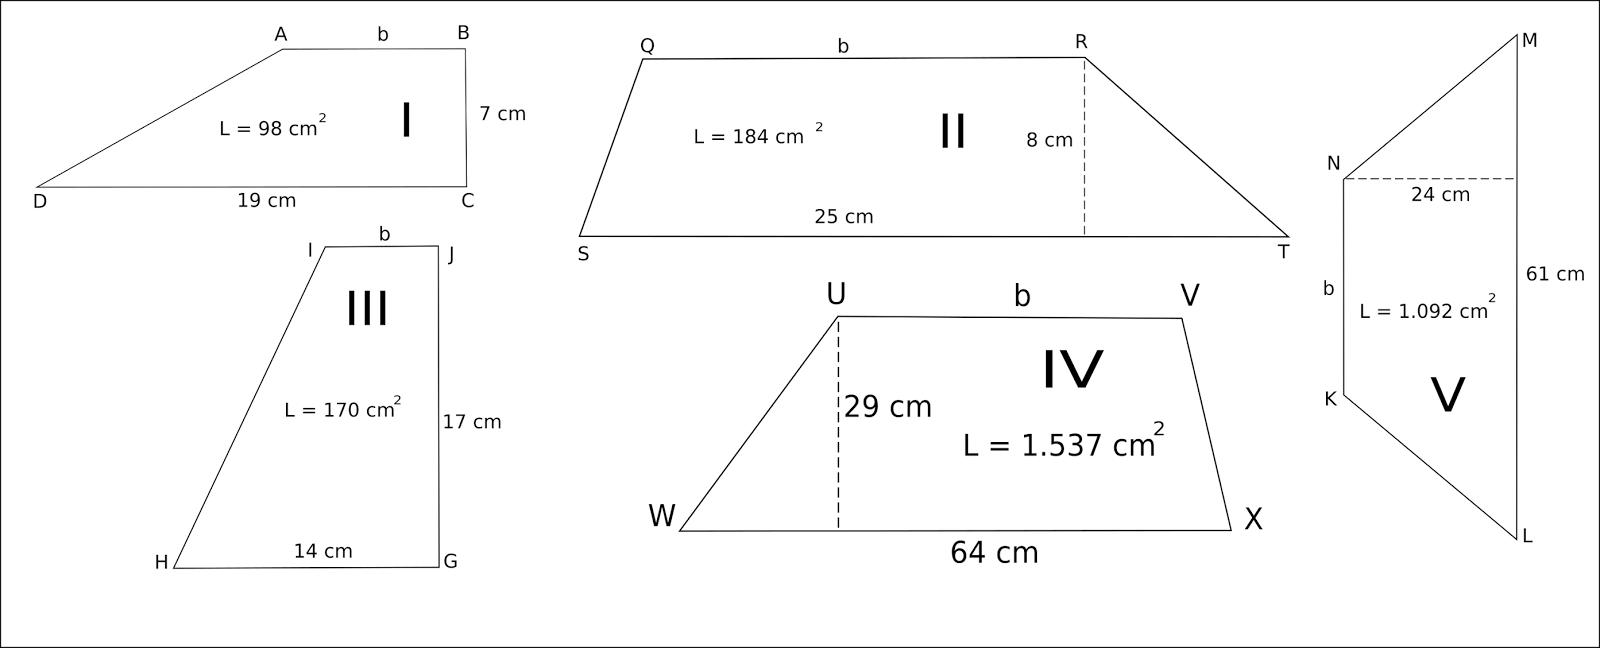 Cara mencari sisi miring trapesium siku siku youtube segitiga merupakan sebuah bangun datar yang dibatasi oleh tiga buah sisi dam memiliki tiga titik sudut. Soal Sd Bab Trapesium Mencari Luas Tinggi Sisi Alas A Dan Sisi Atas B Dan Kunci Jawaban Pembahasannya Bimbel Brilian